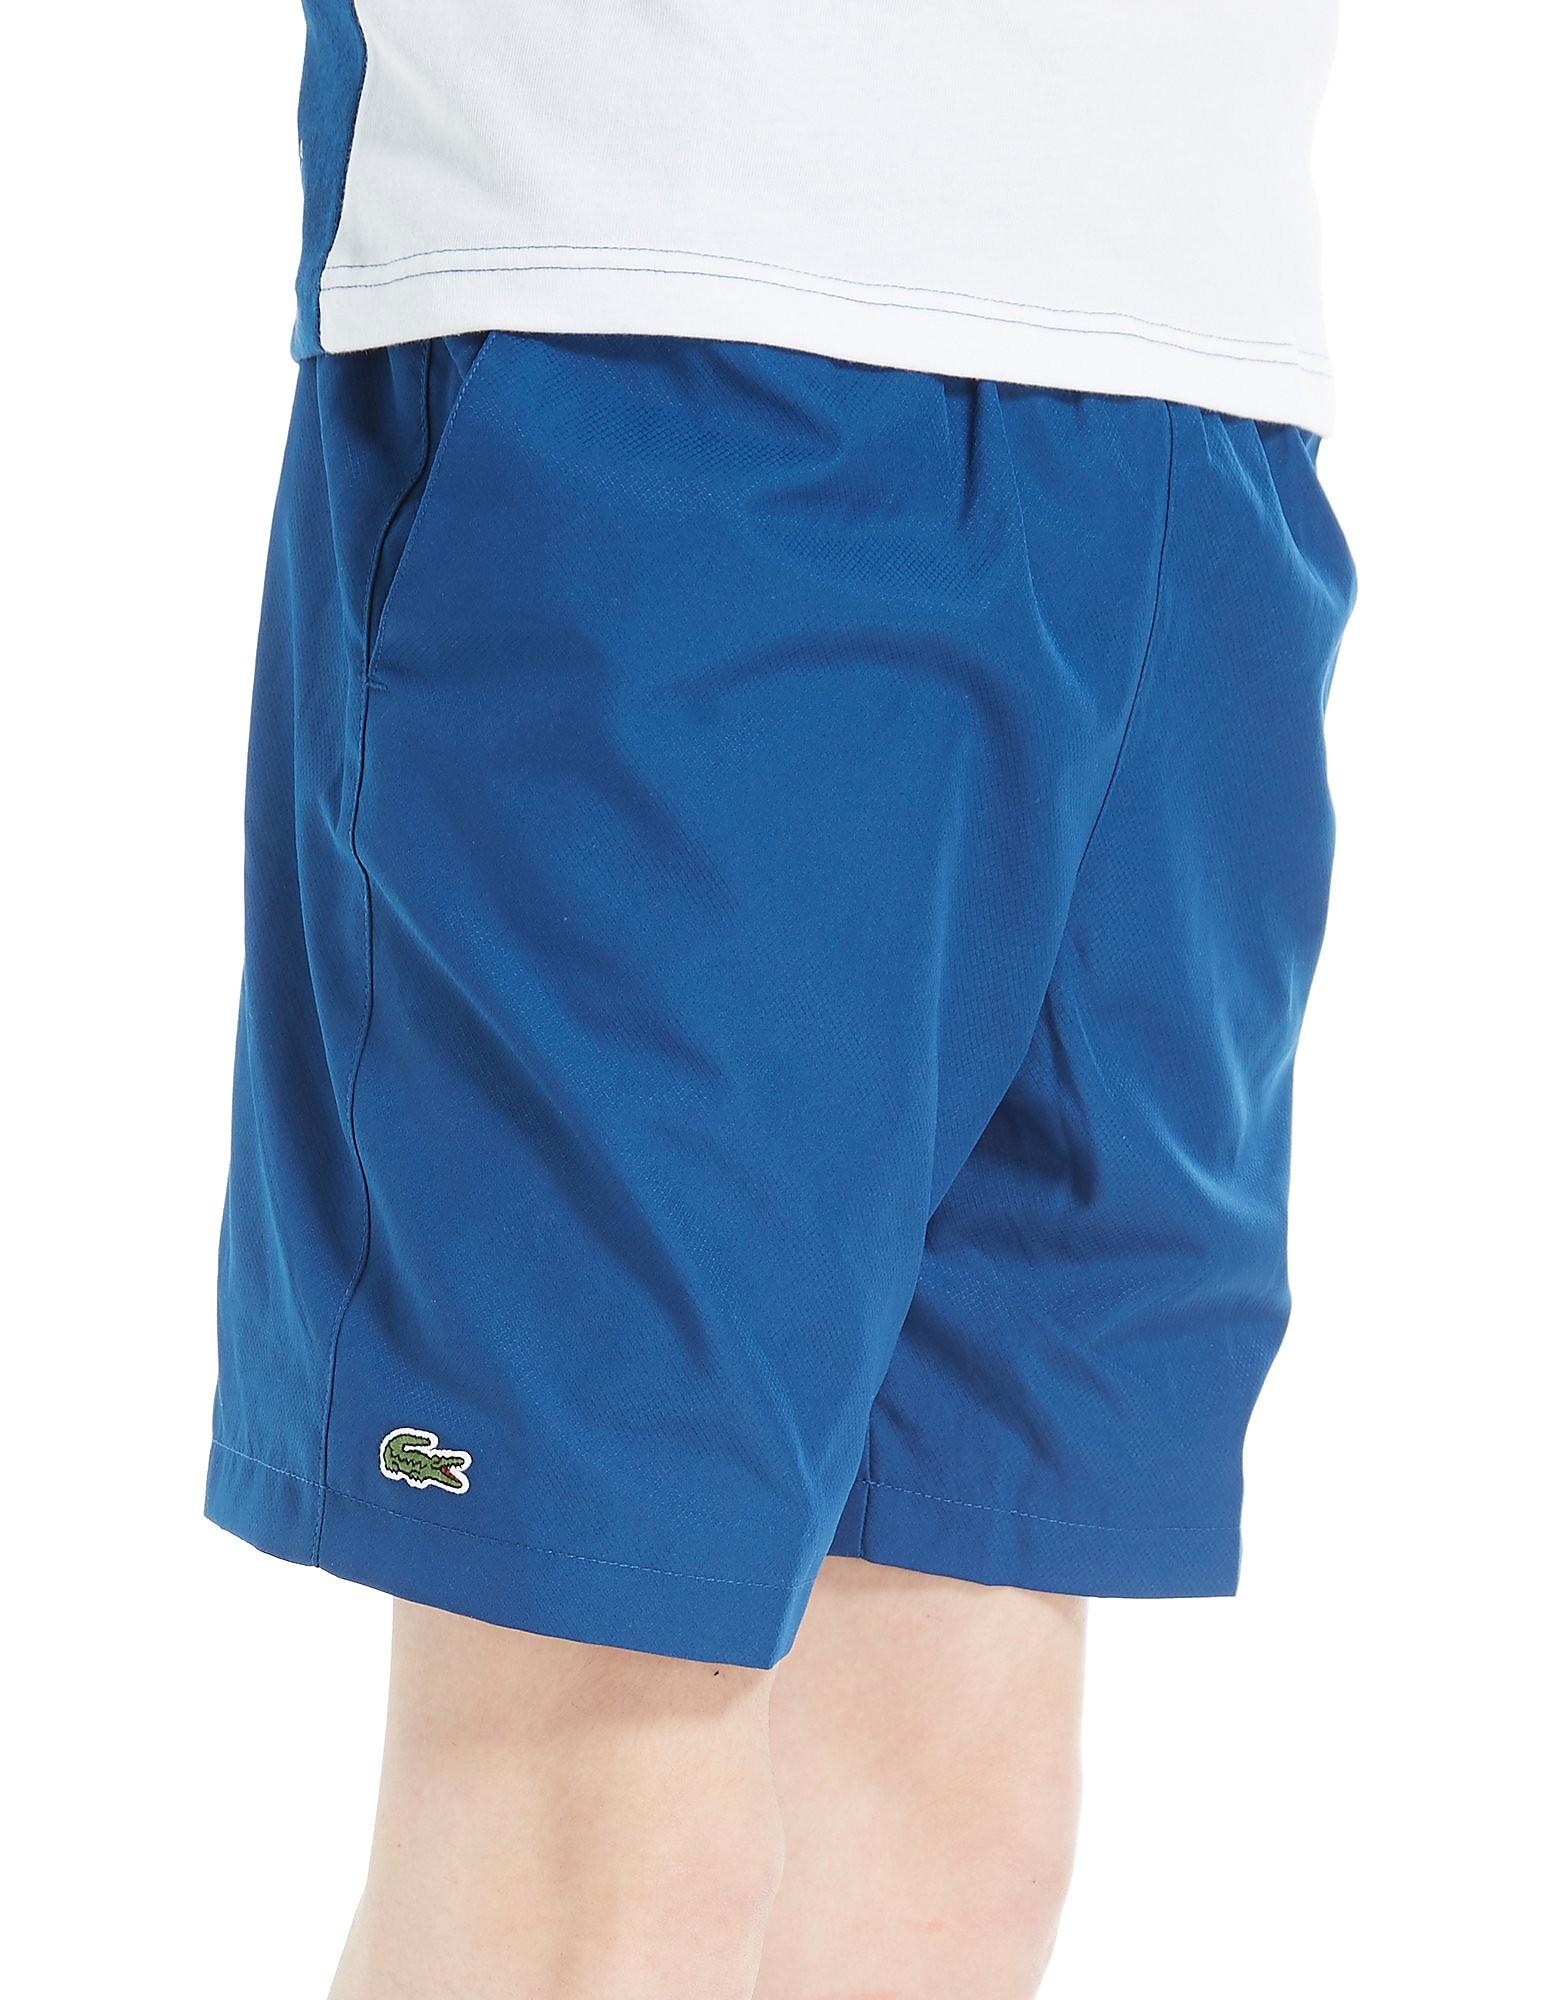 Lacoste Woven Shorts Junior - Blauw - Kind